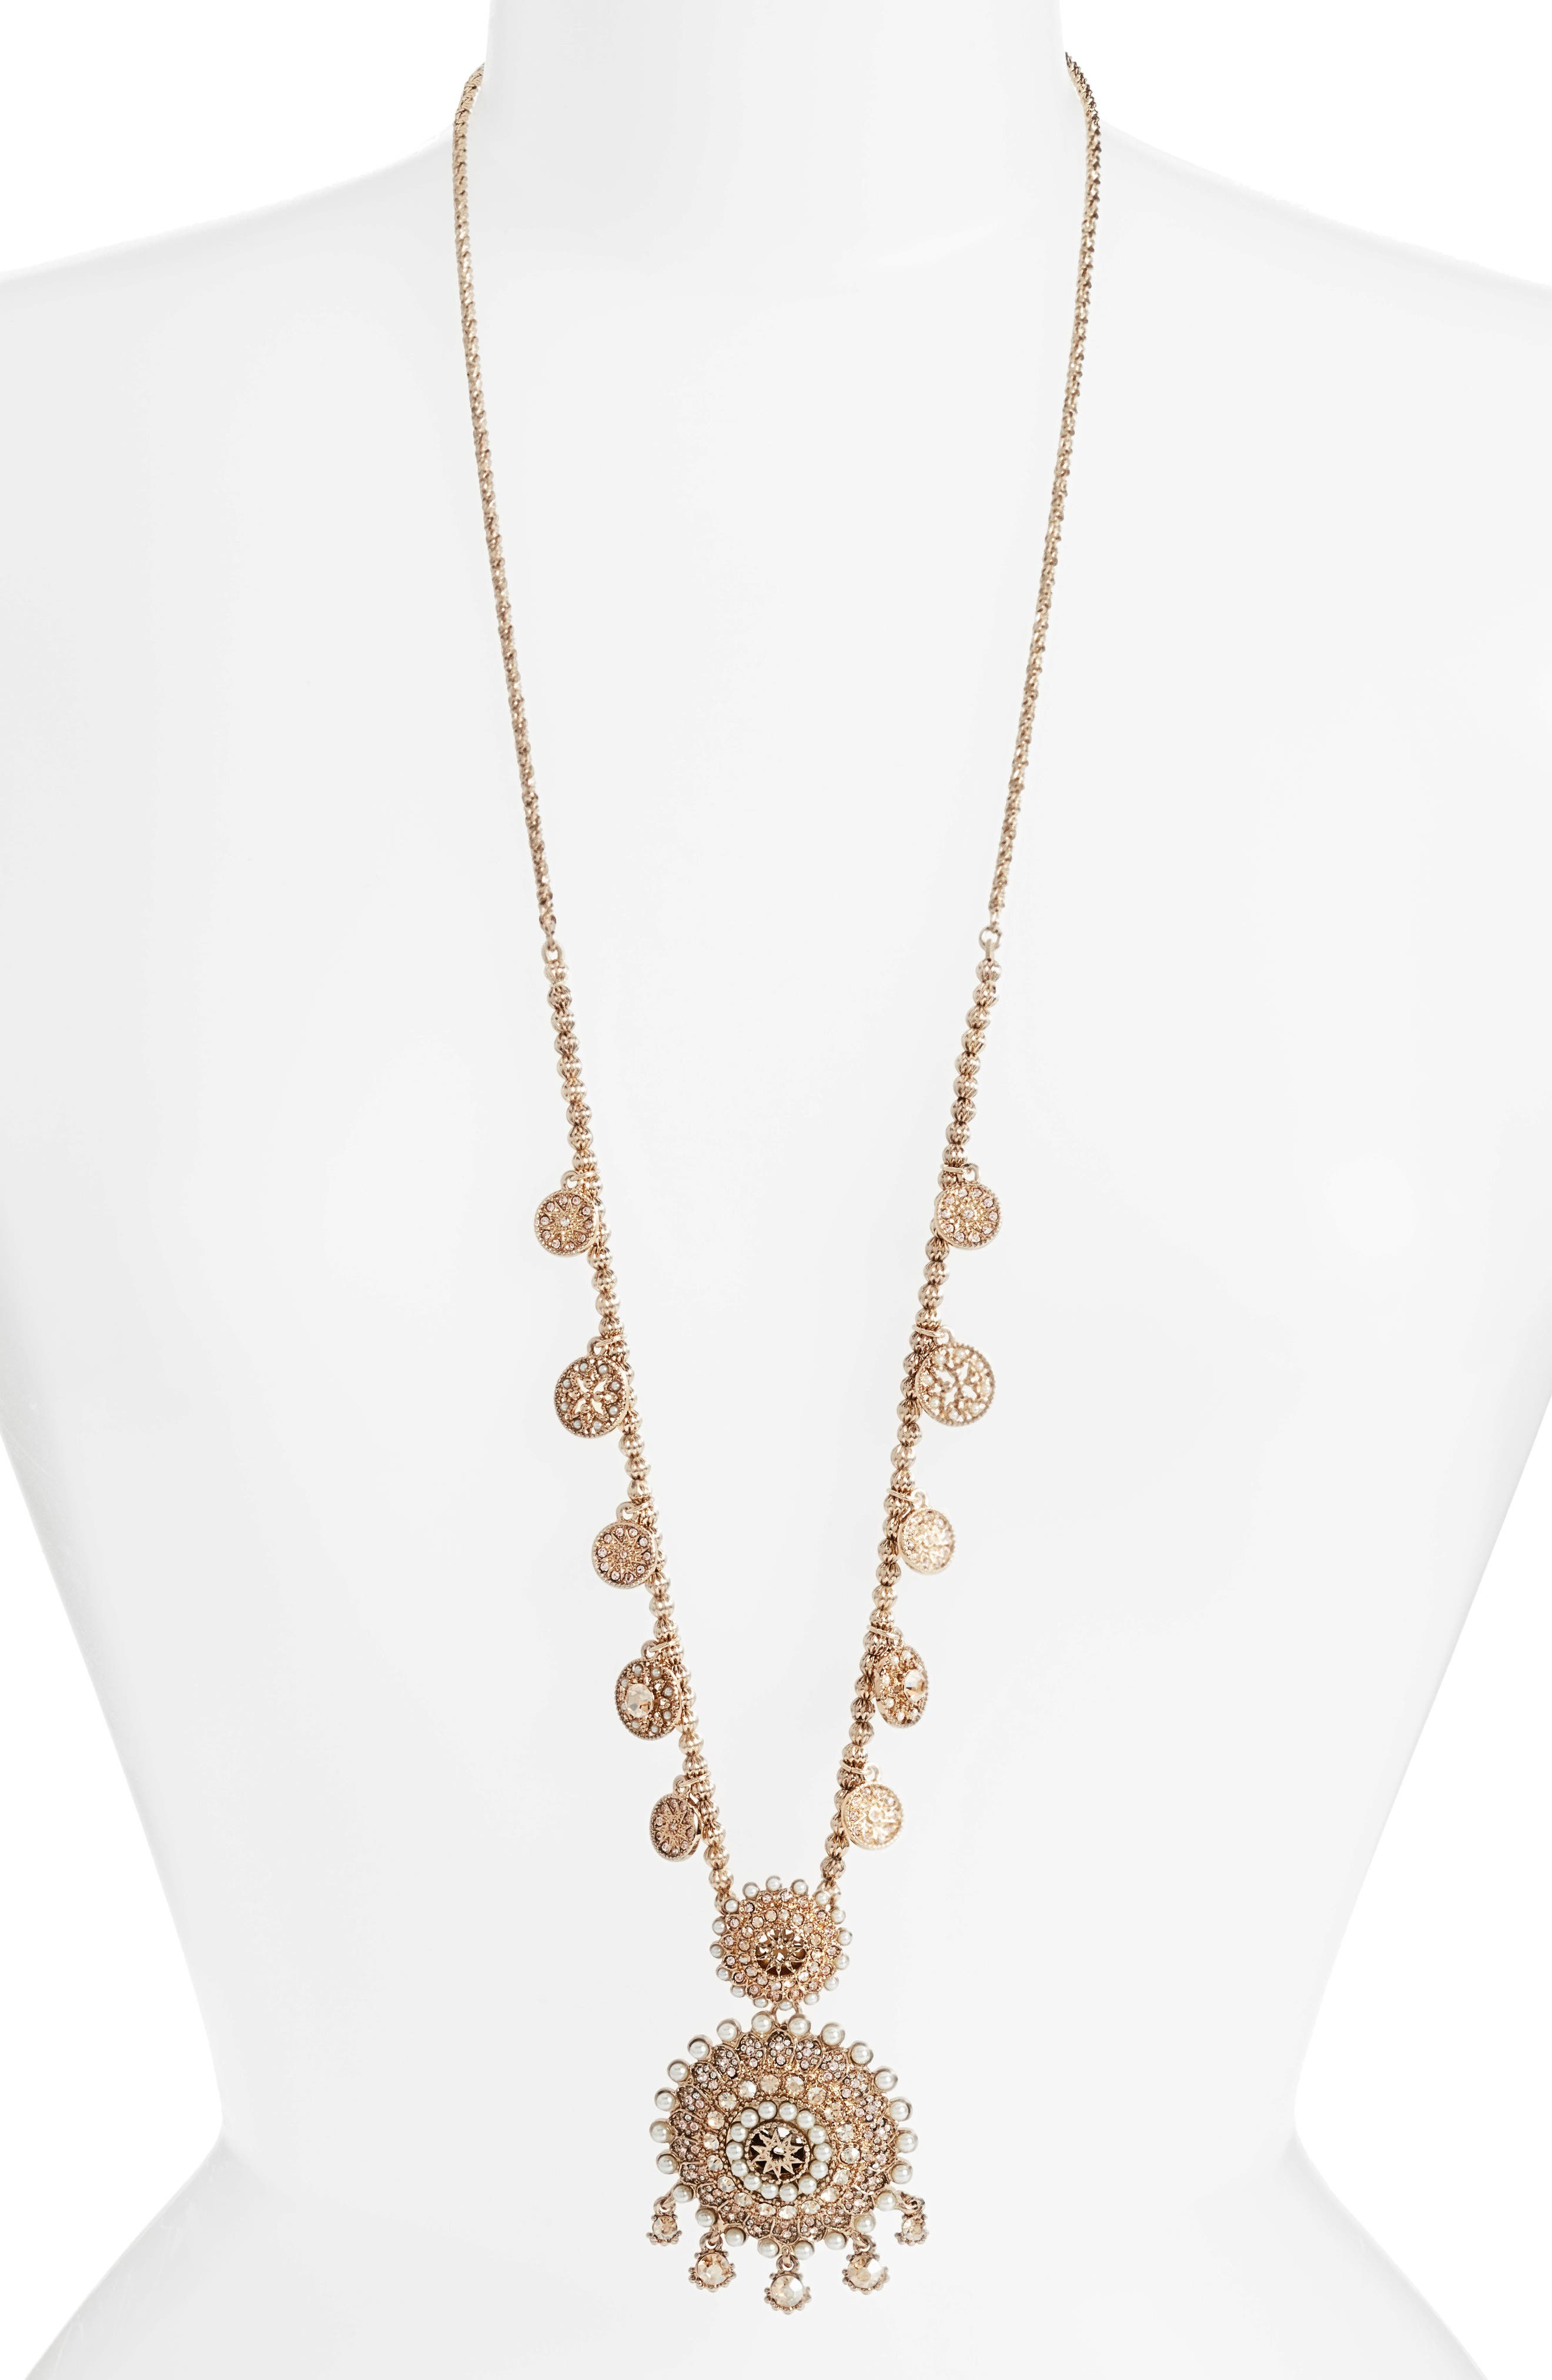 Alternate Image 1 Selected - Marchesa Pendant Necklace